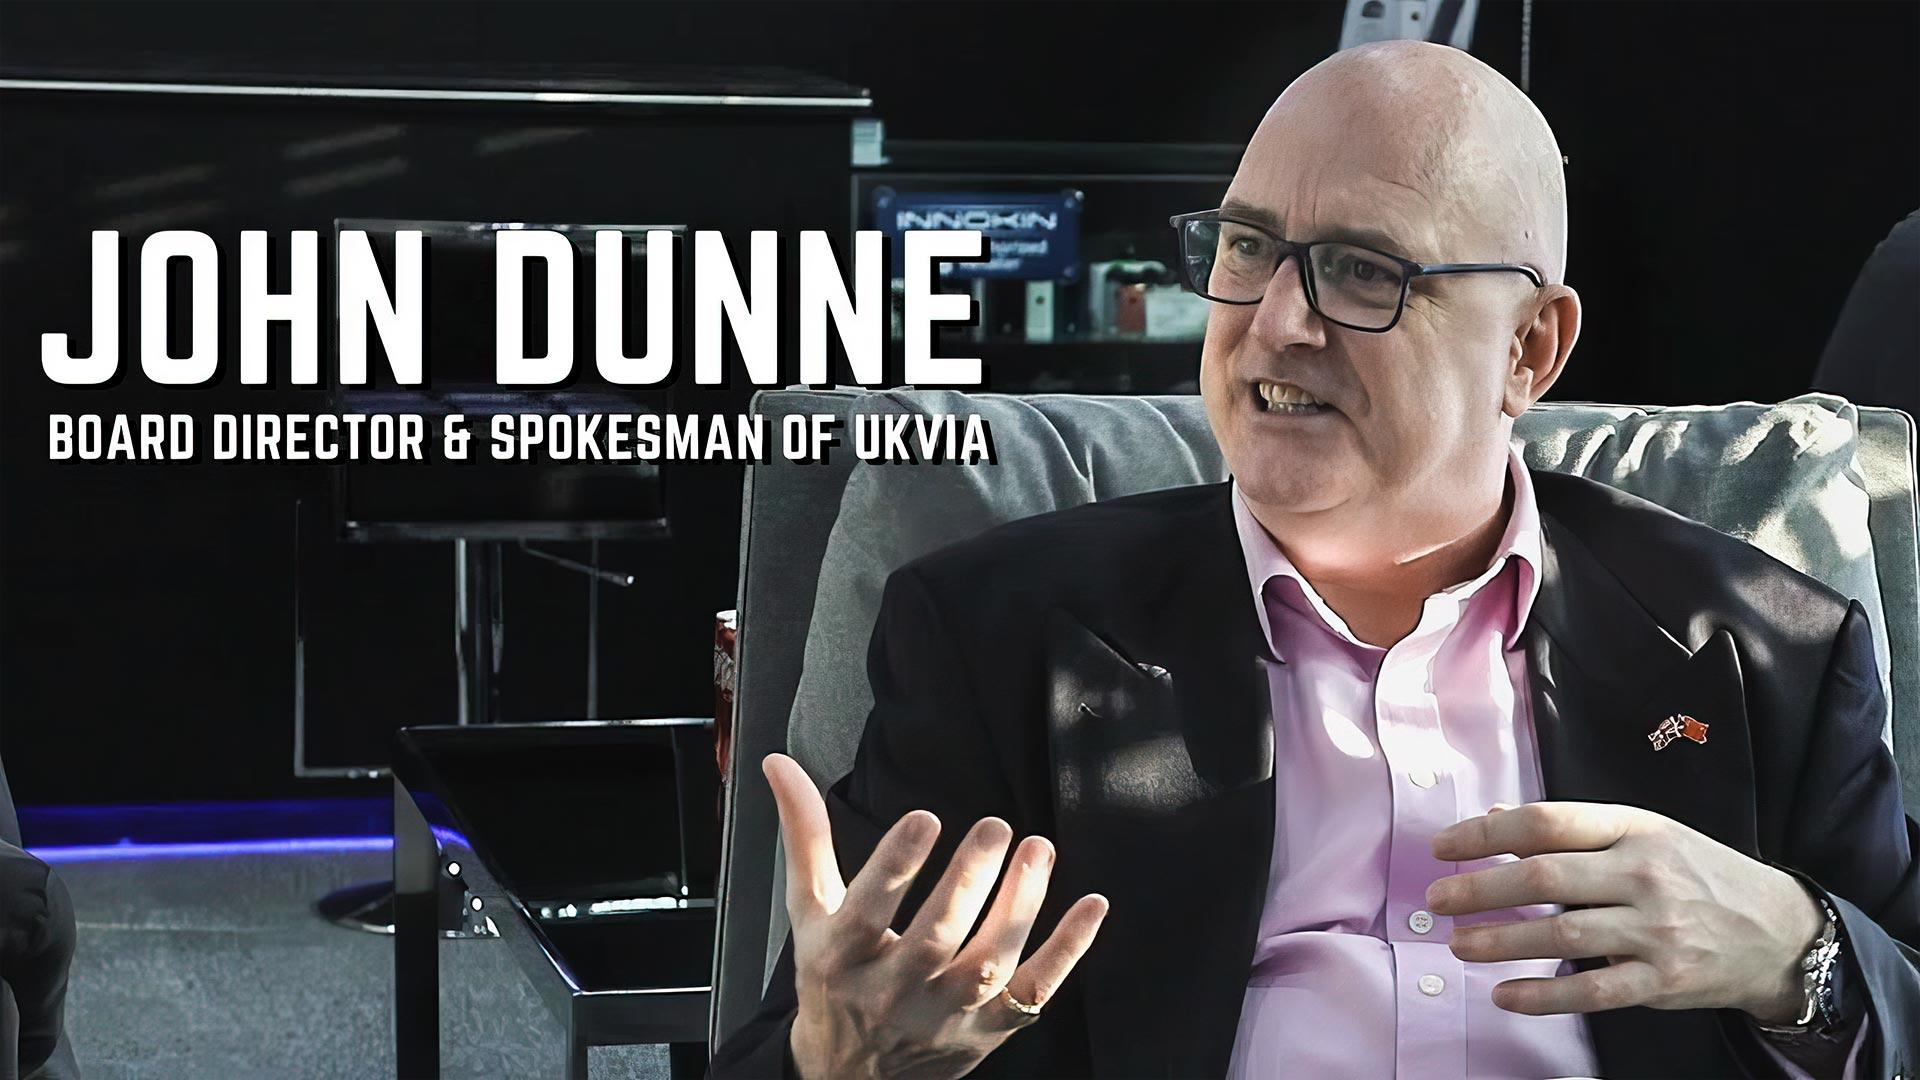 Mr. John Dunne from UKVIA Visited Innokin headquarter in Shenzhen